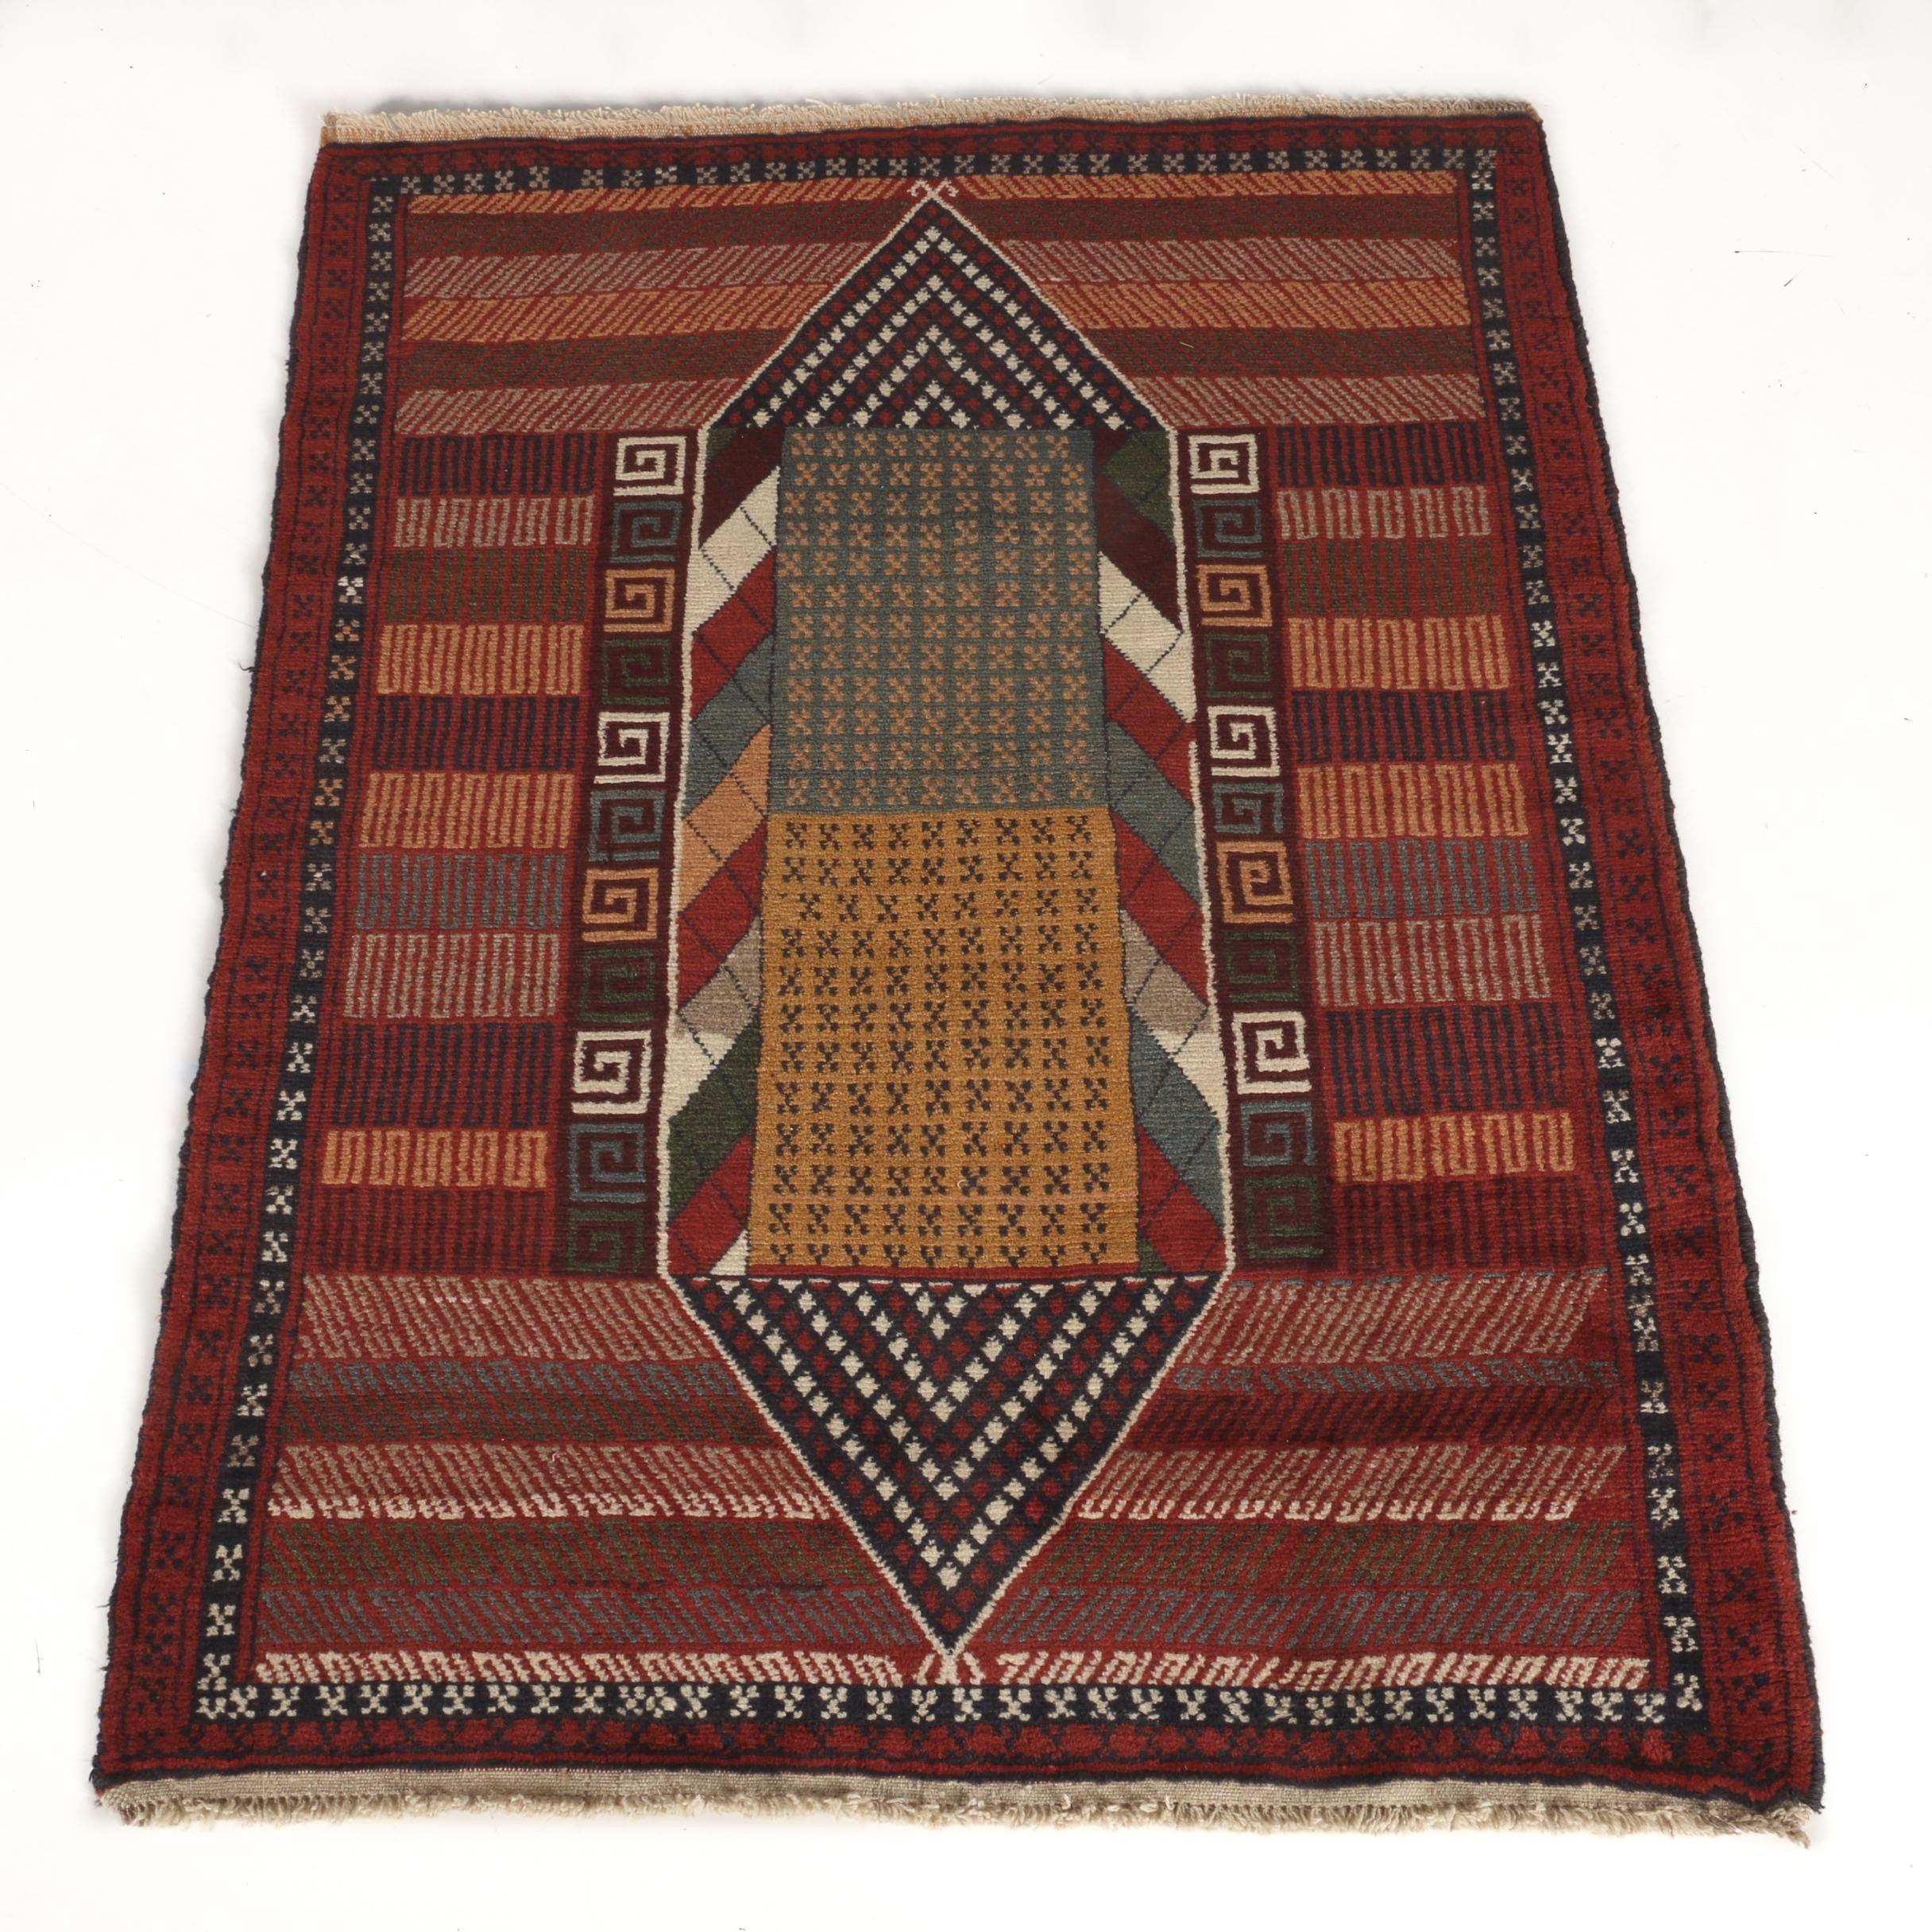 Hand-Knotted Persian Kurdi Area Rug